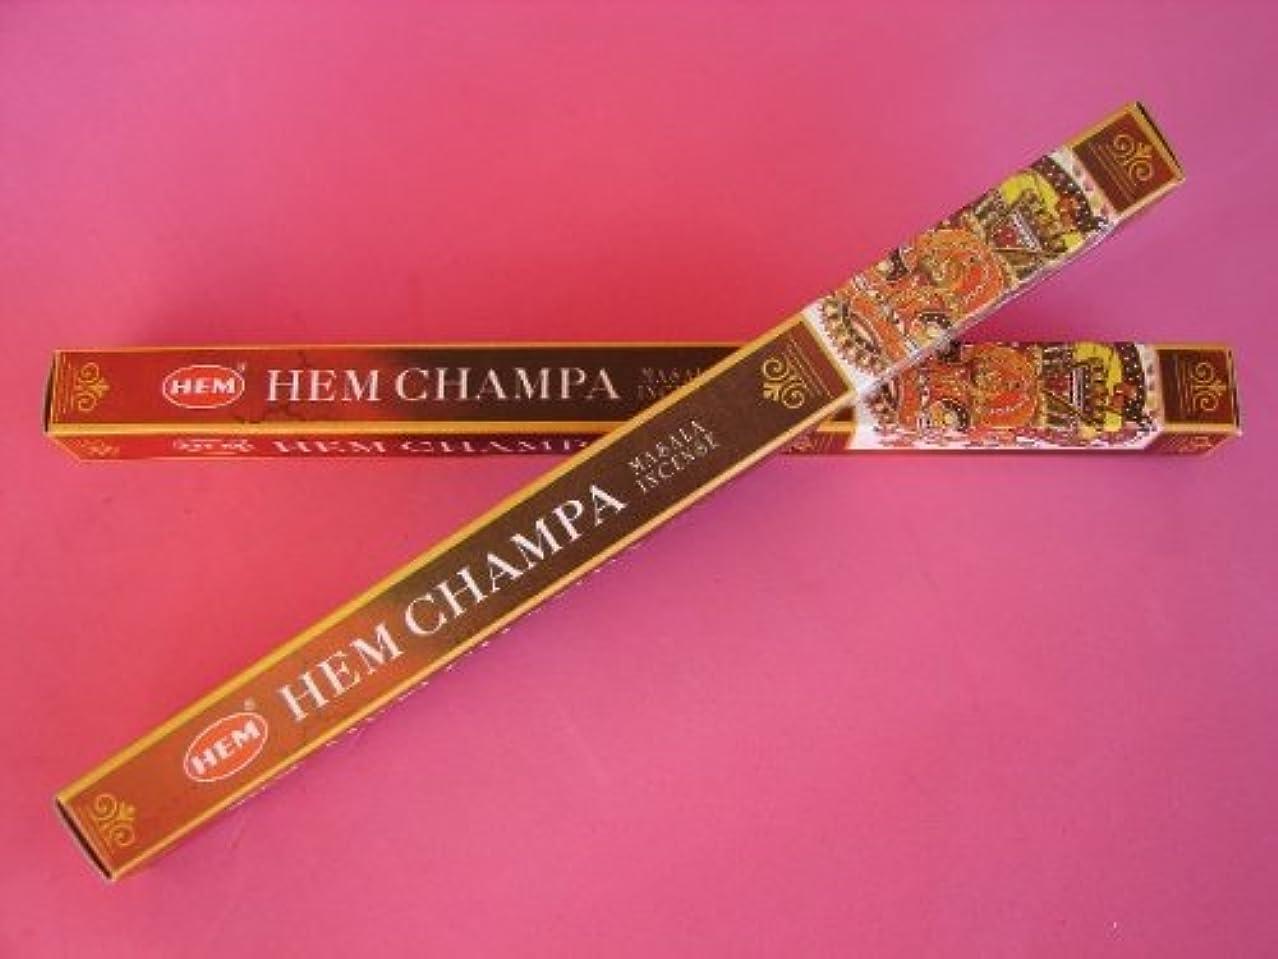 確率進行中電気陽性4 Boxes of HEM CHAMPA Incense Sticks